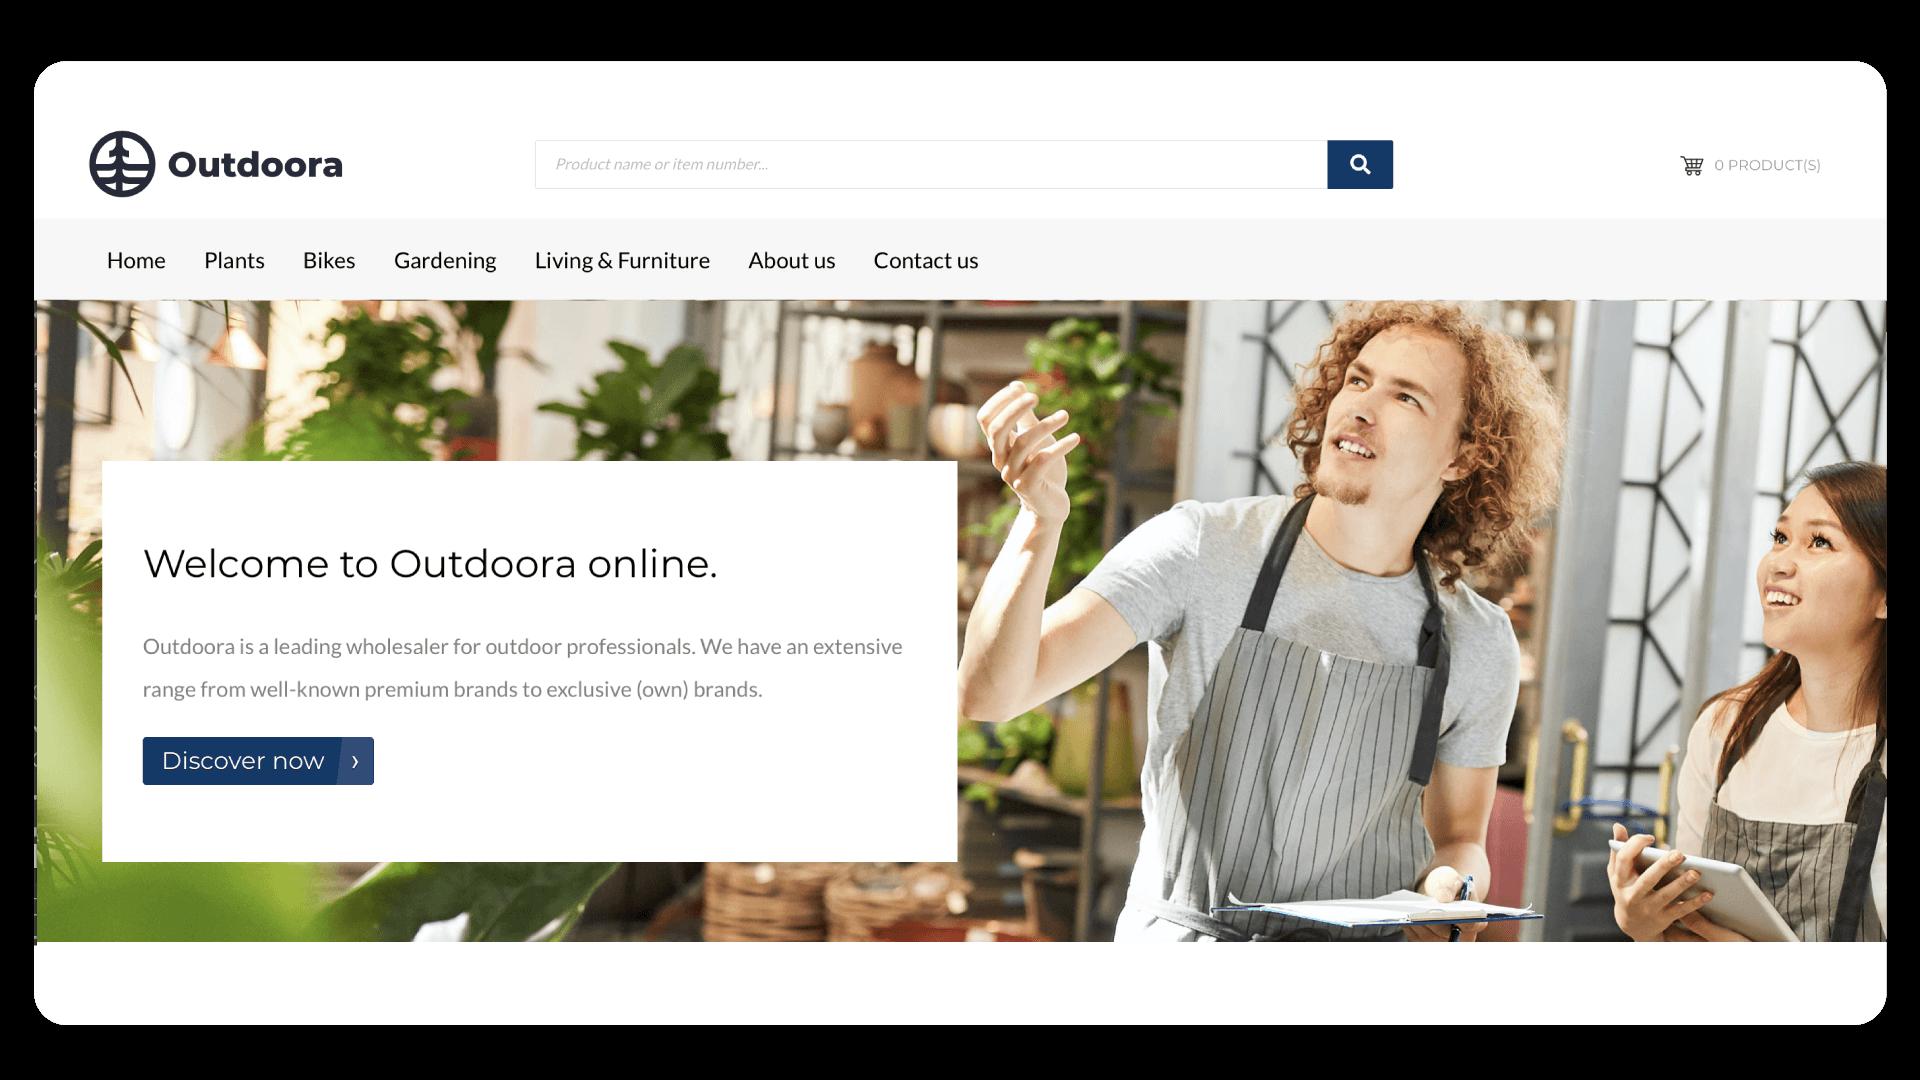 Sana Commerce Cloud Product